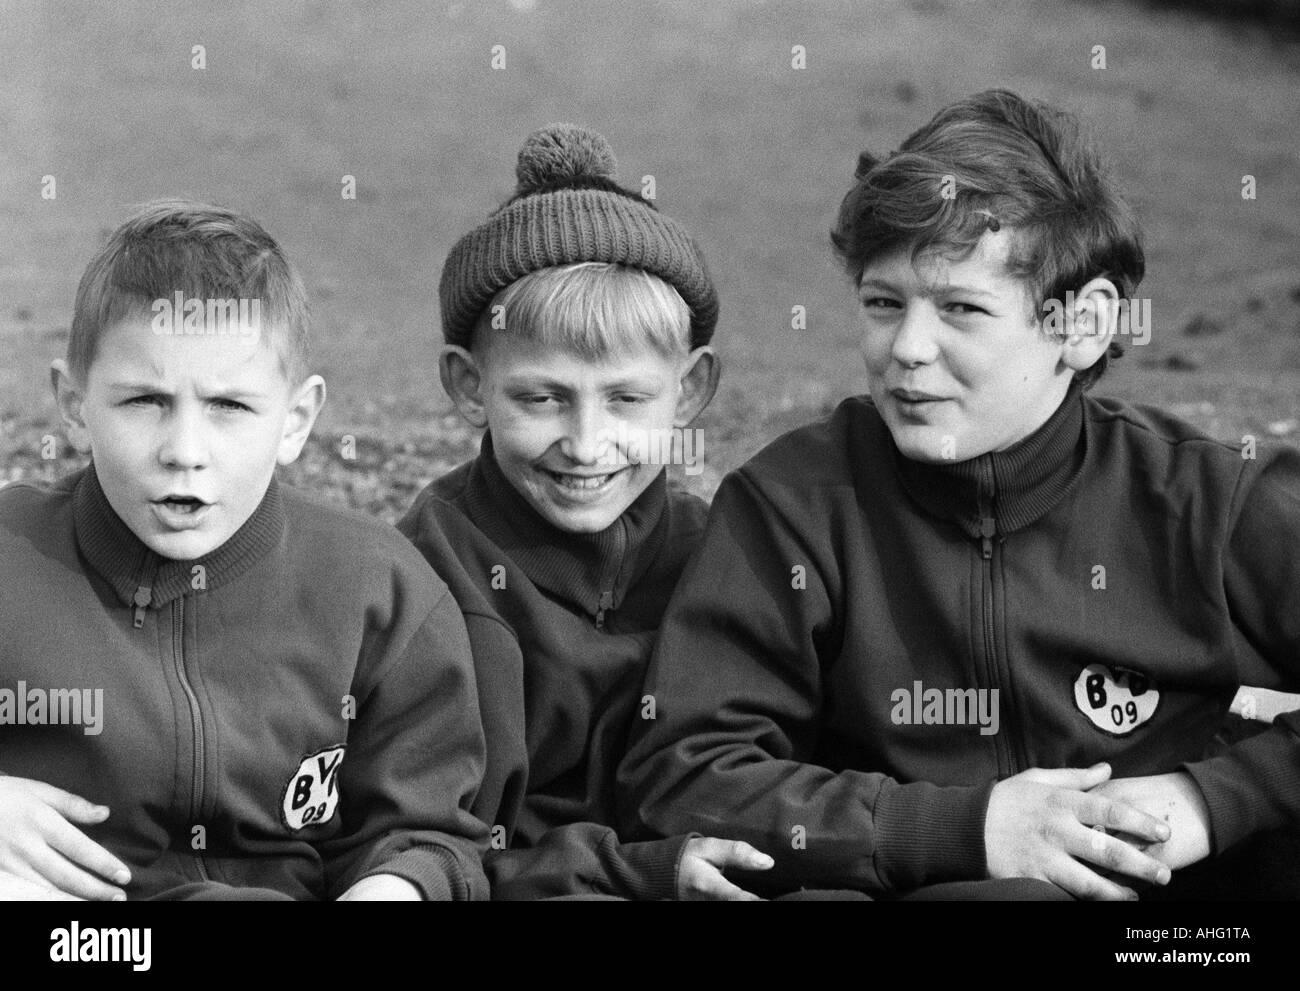 football, Bundesliga, 1966/1967, Borussia Dortmund versus Borussia Moenchengladbach 3:2, Stadium Rote Erde in Dortmund, three young boys, fans of Borussia Dortmund - Stock Image